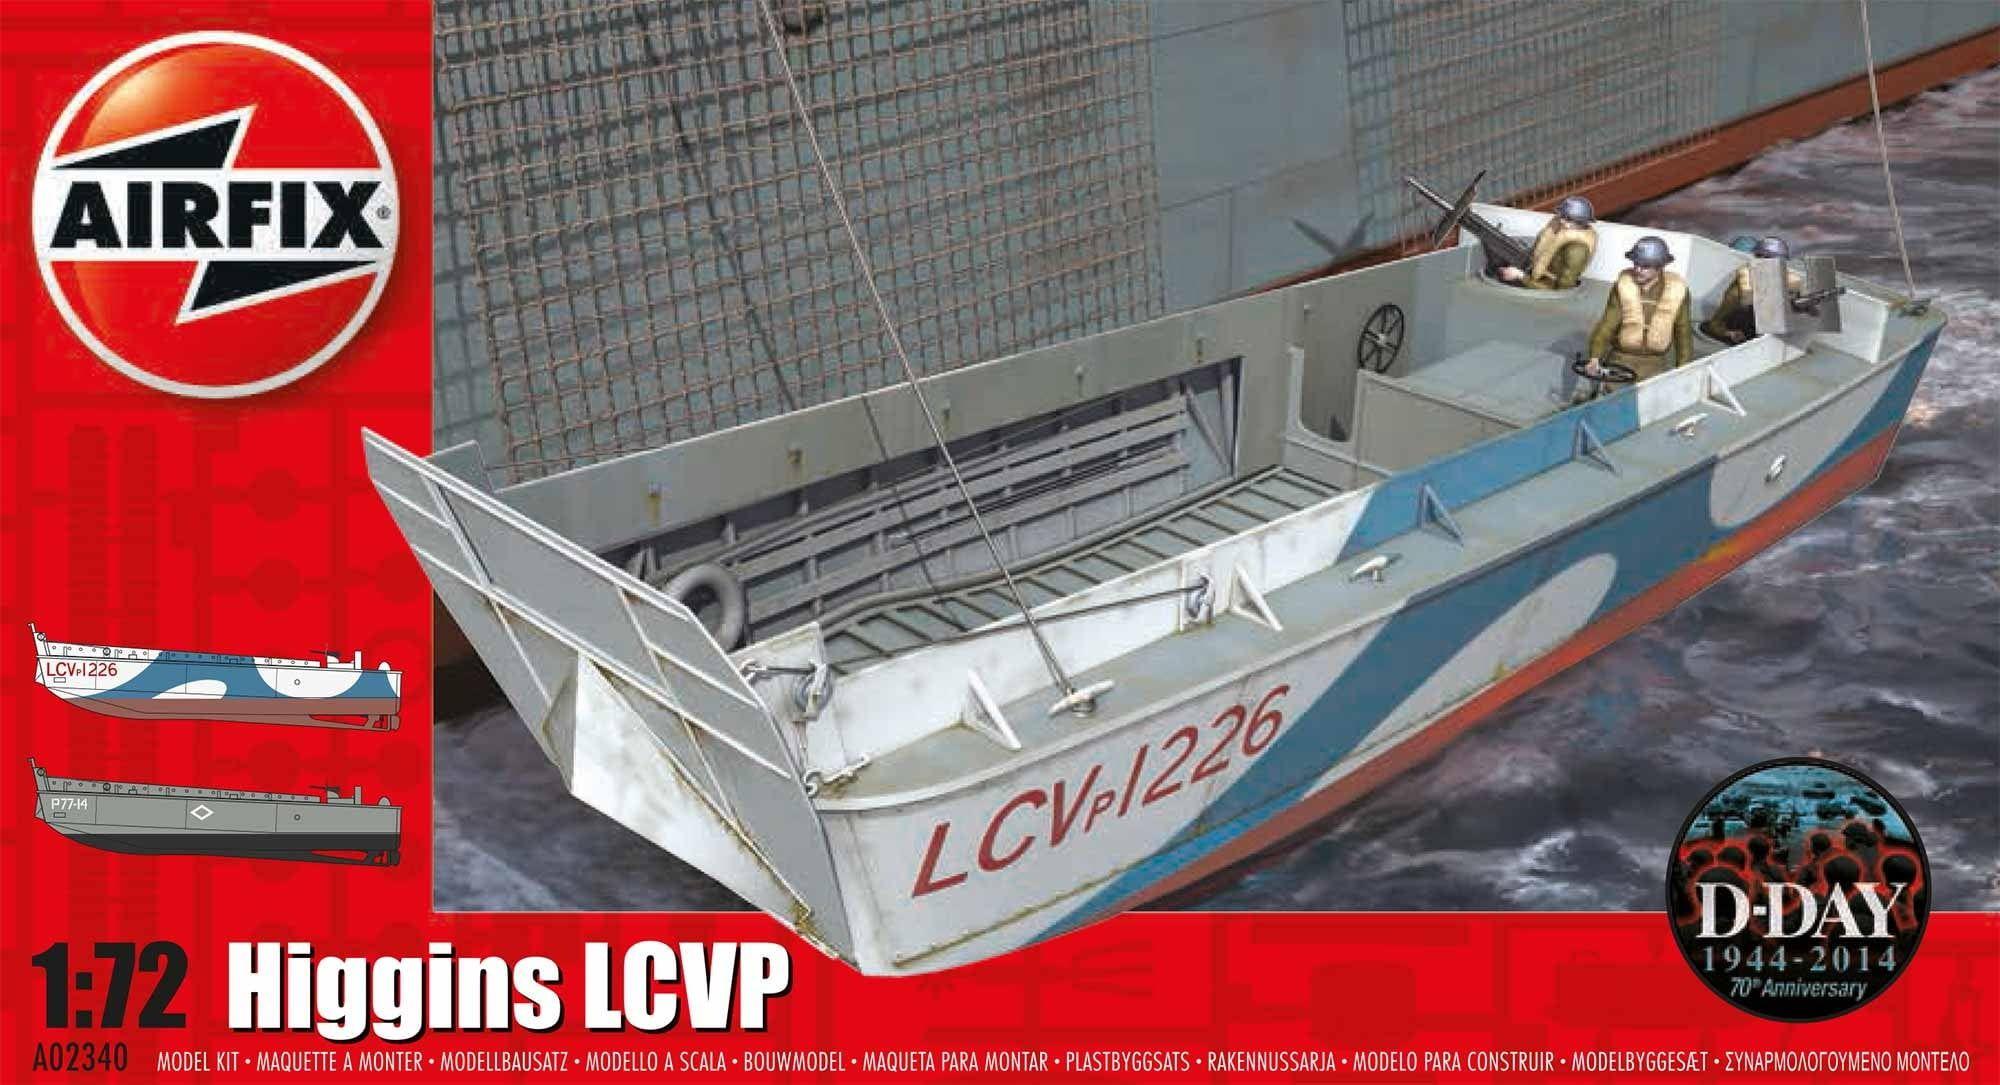 Airfix Higgins LCVP 1:72 Scale Plastic Model Kit